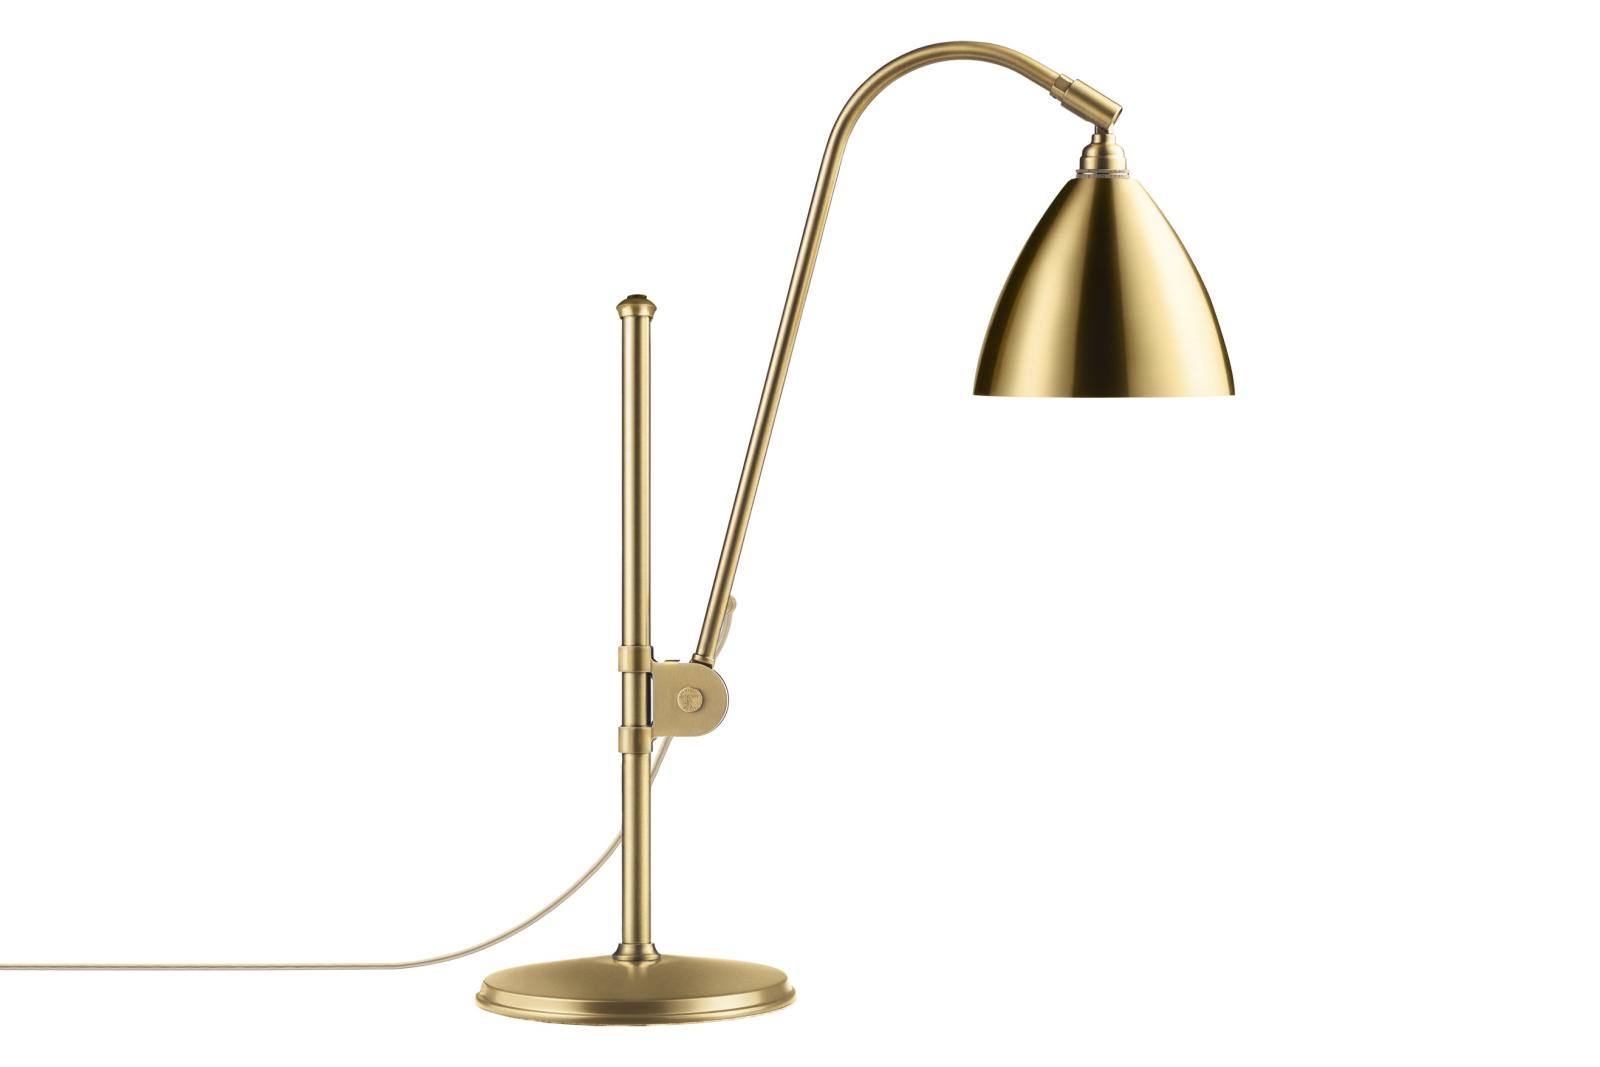 Bestlite BL1 Table Lamp Brass